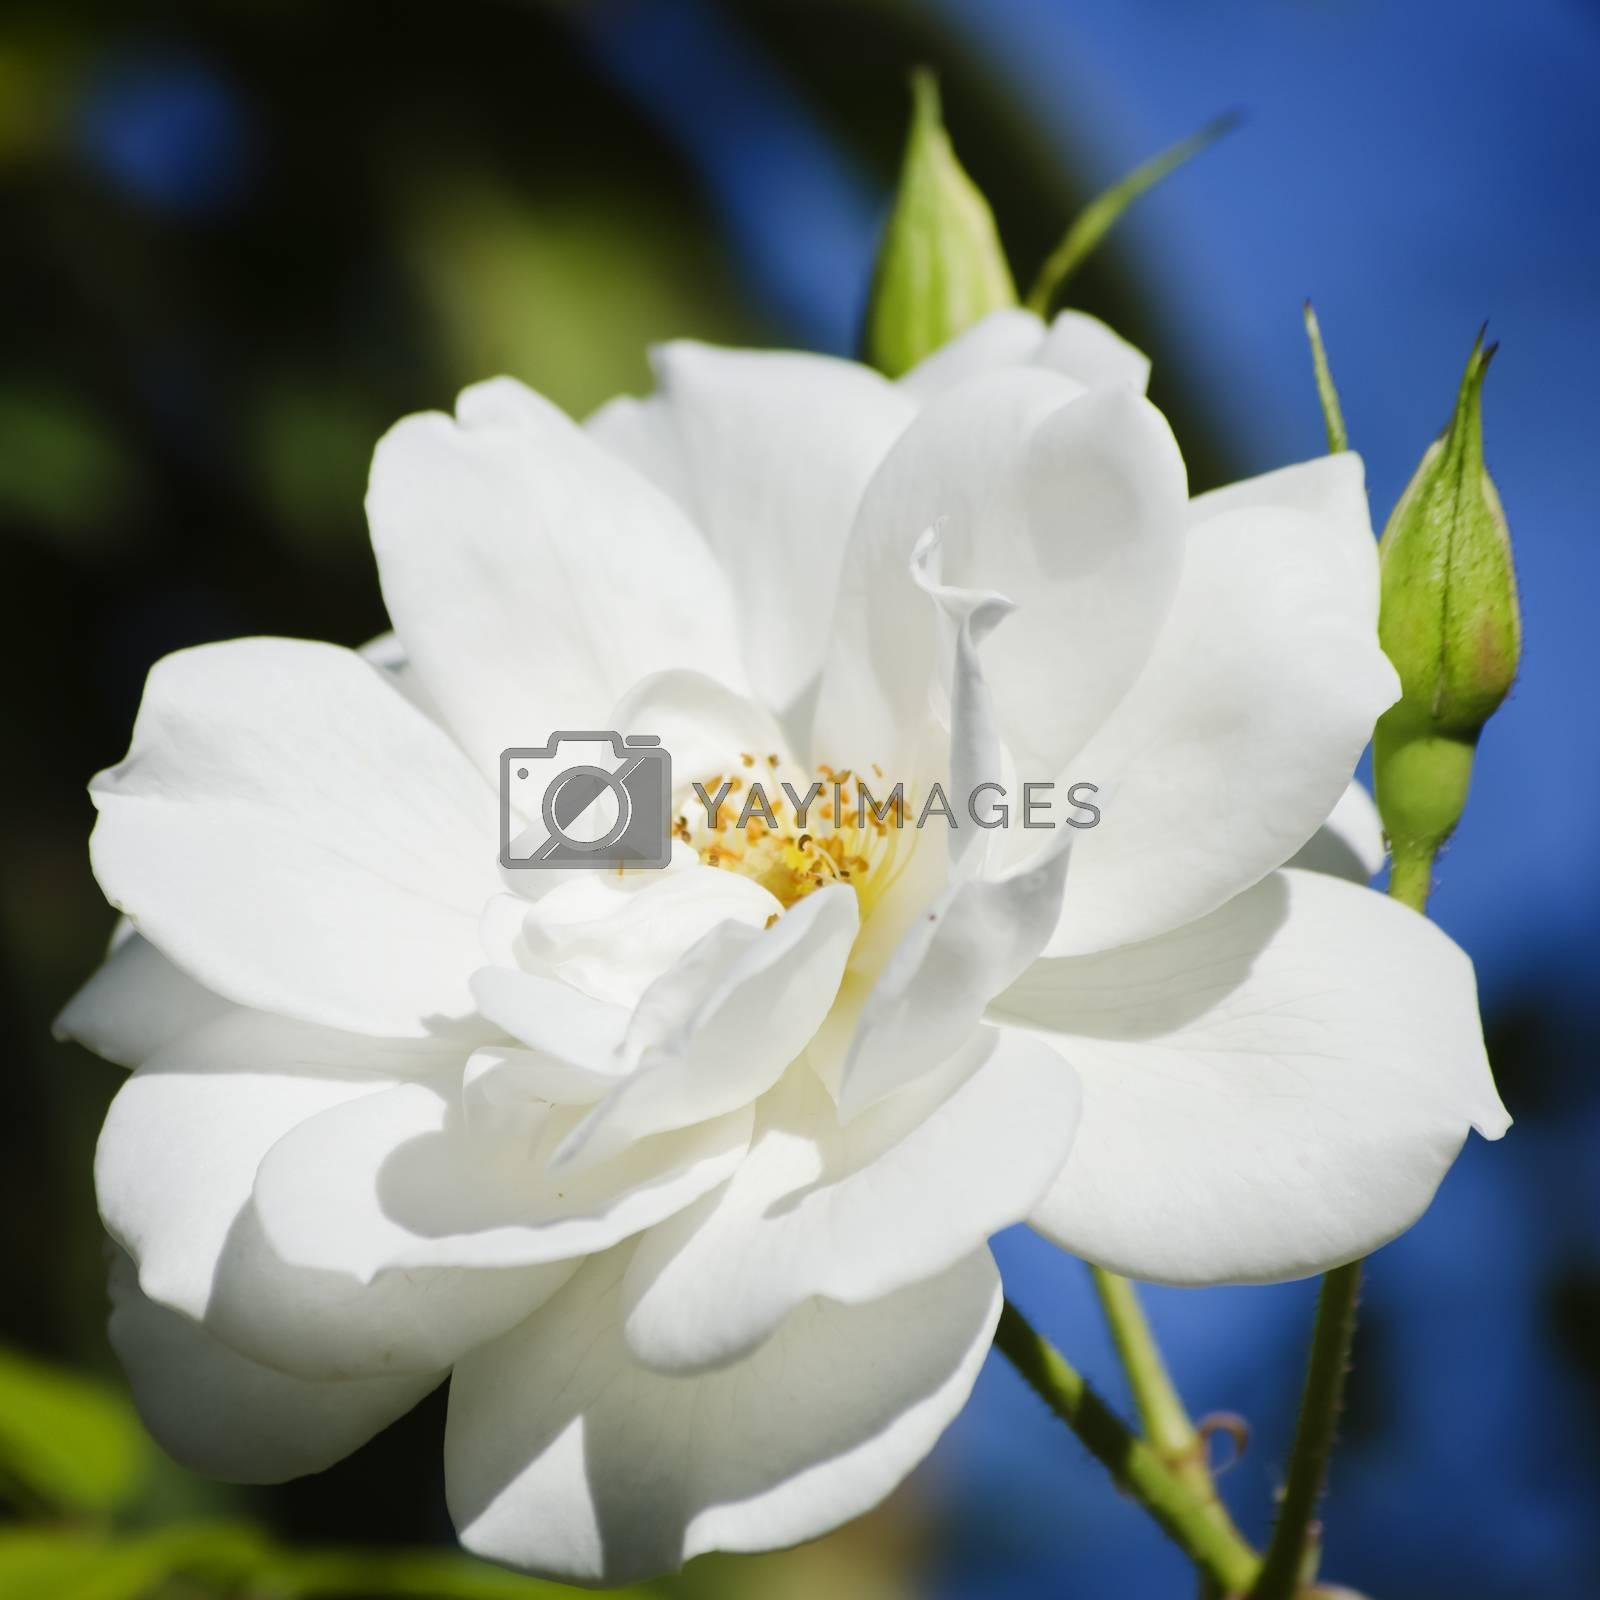 Single Close Up White Rose Over Blue Sky Background